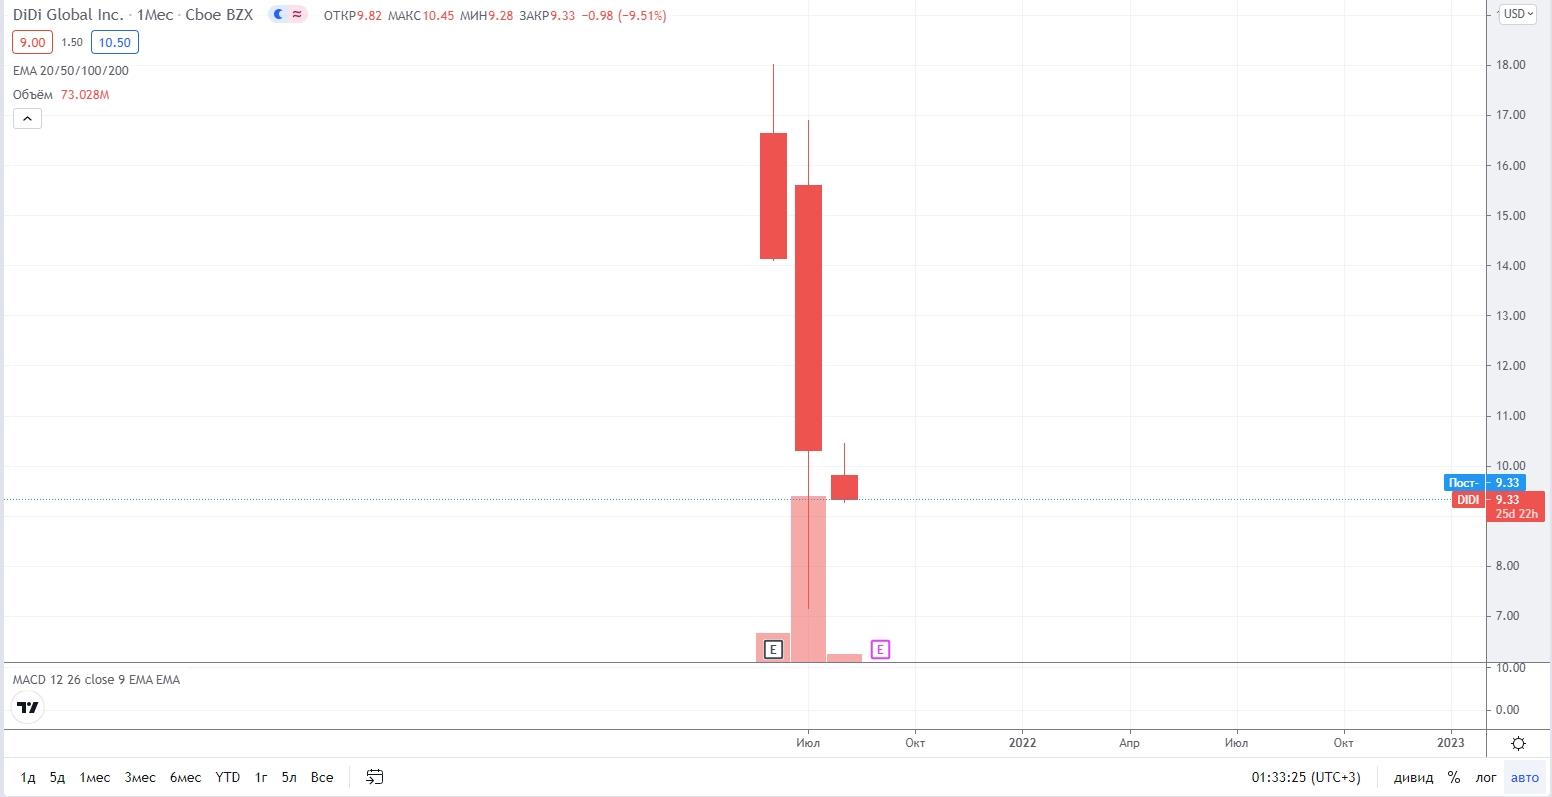 График стоимости акций DIDI